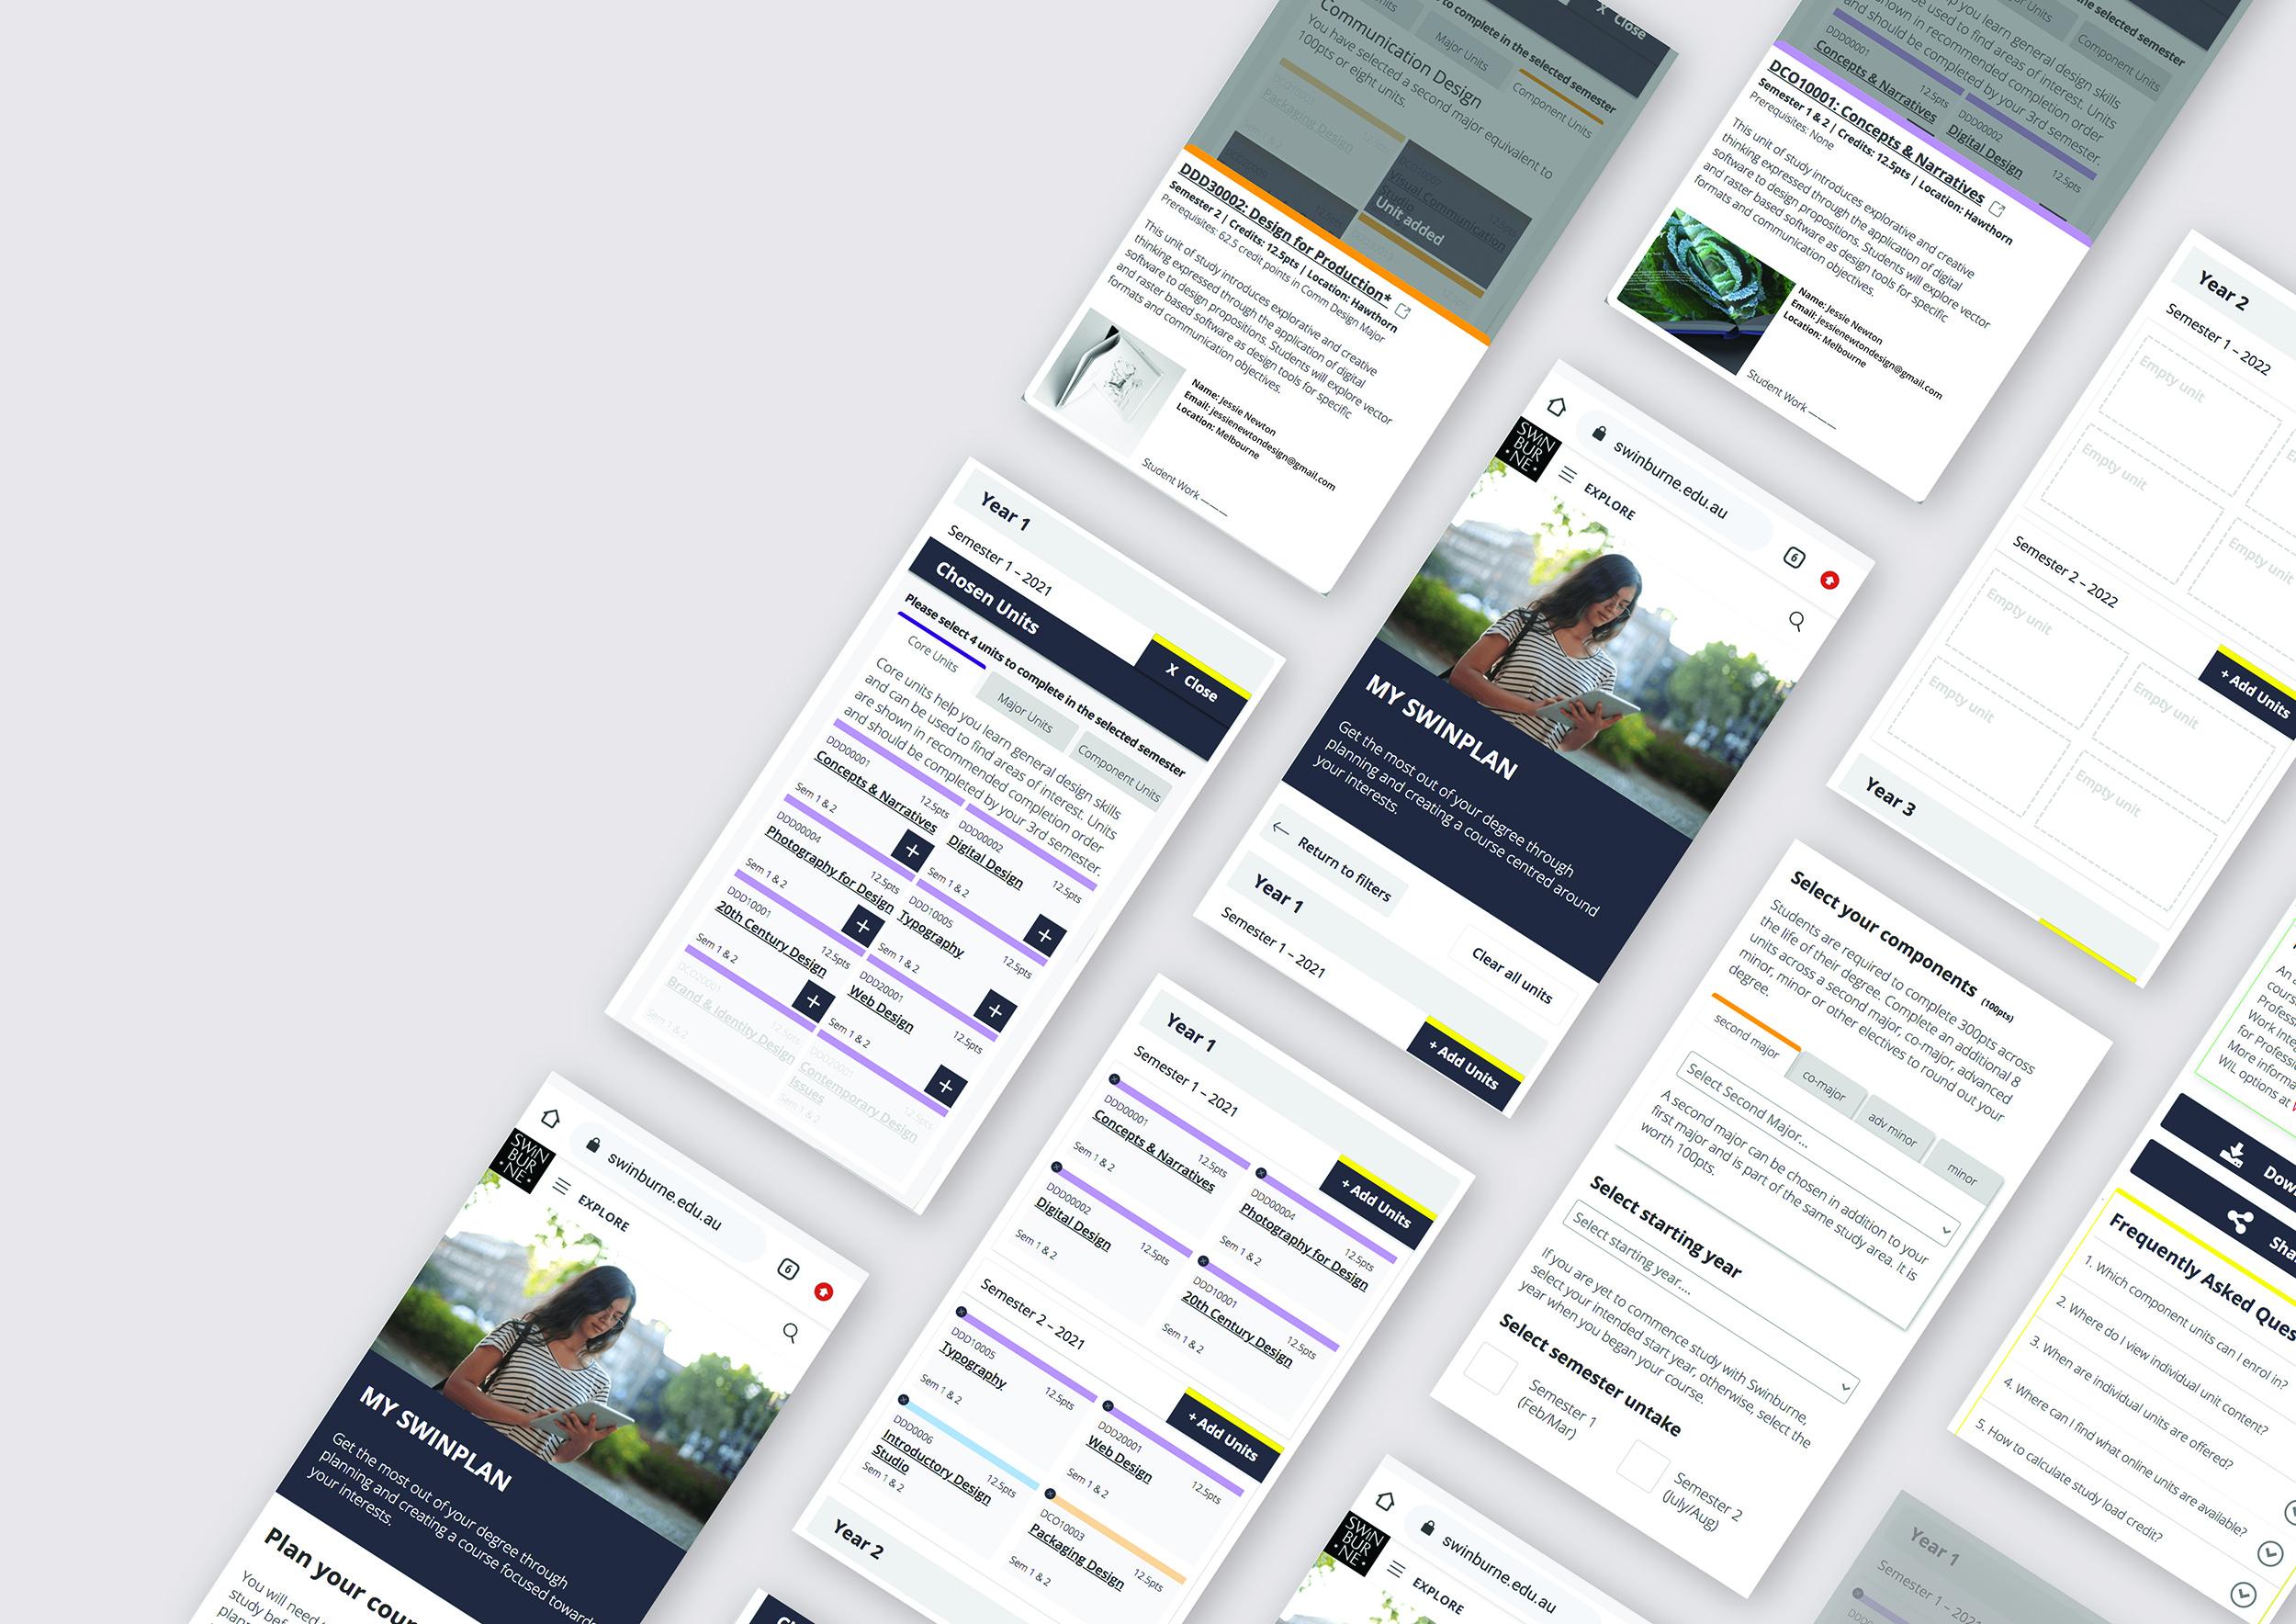 Multiple screens showing the My Swinplan Mobile app